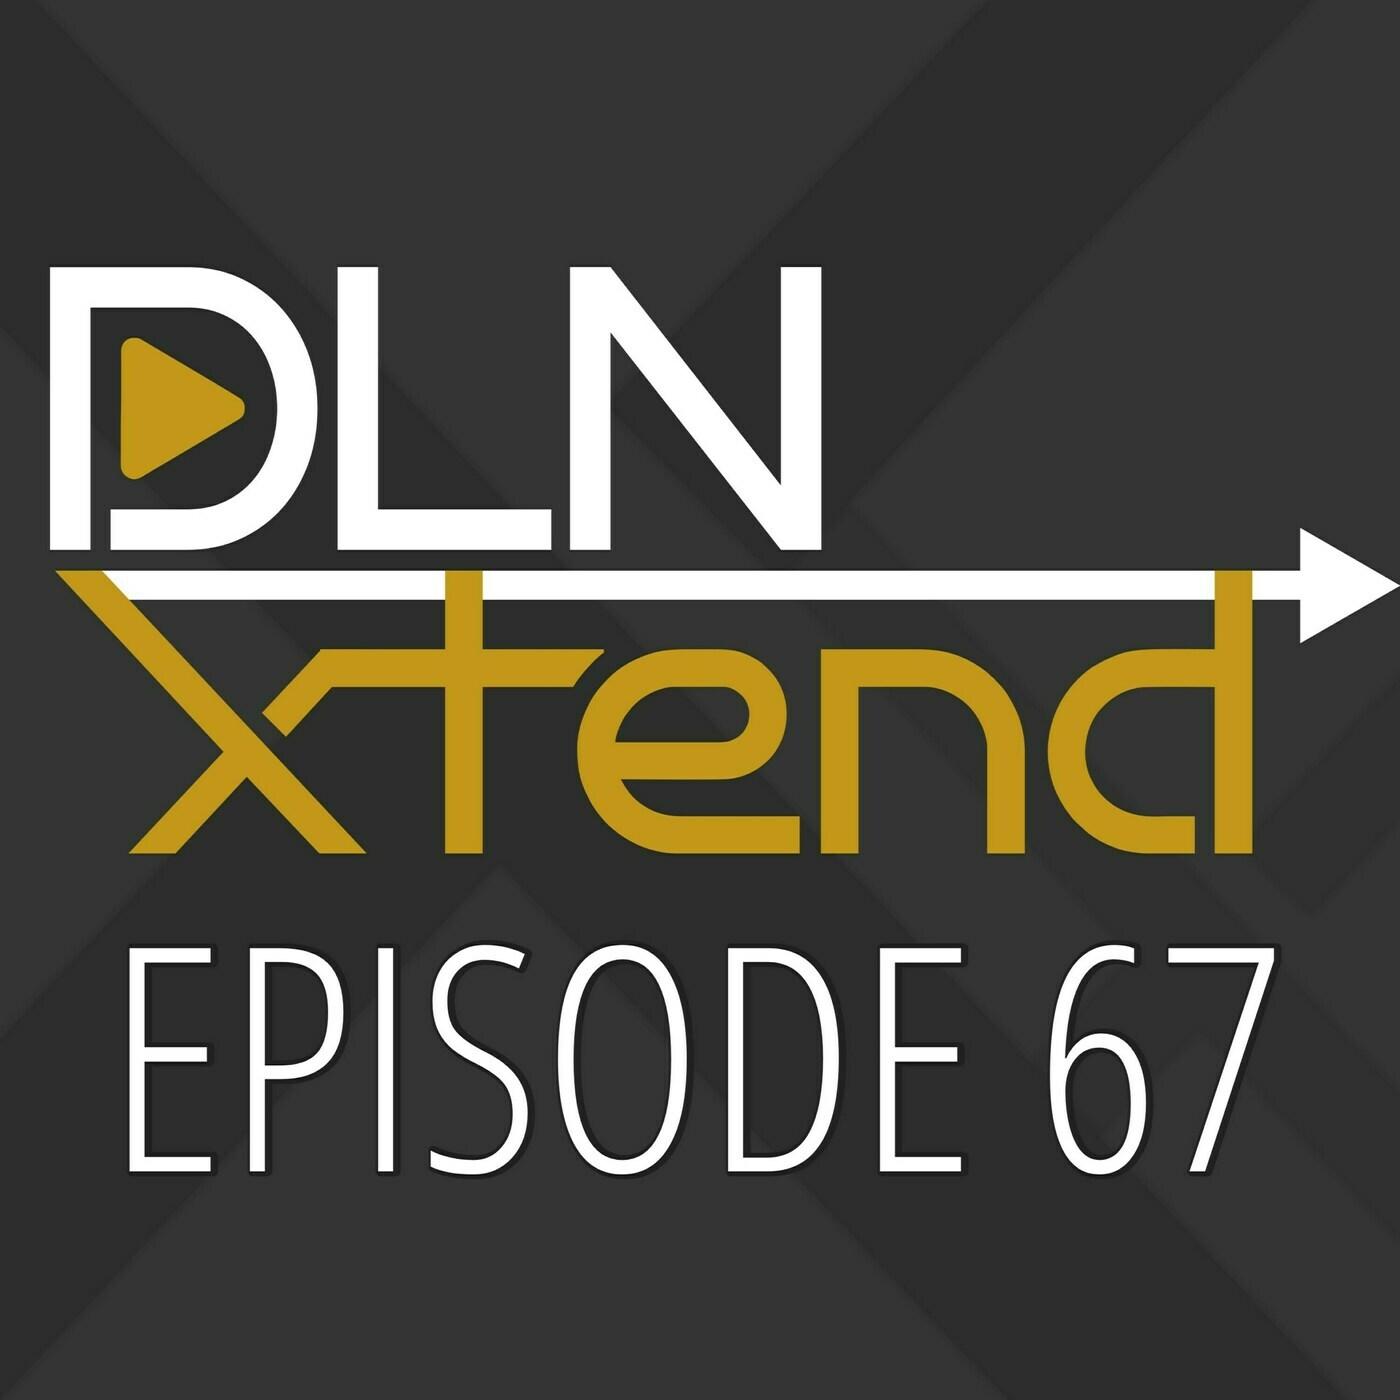 DLN Xtend 67: The Steam Deck | DLN Xtend